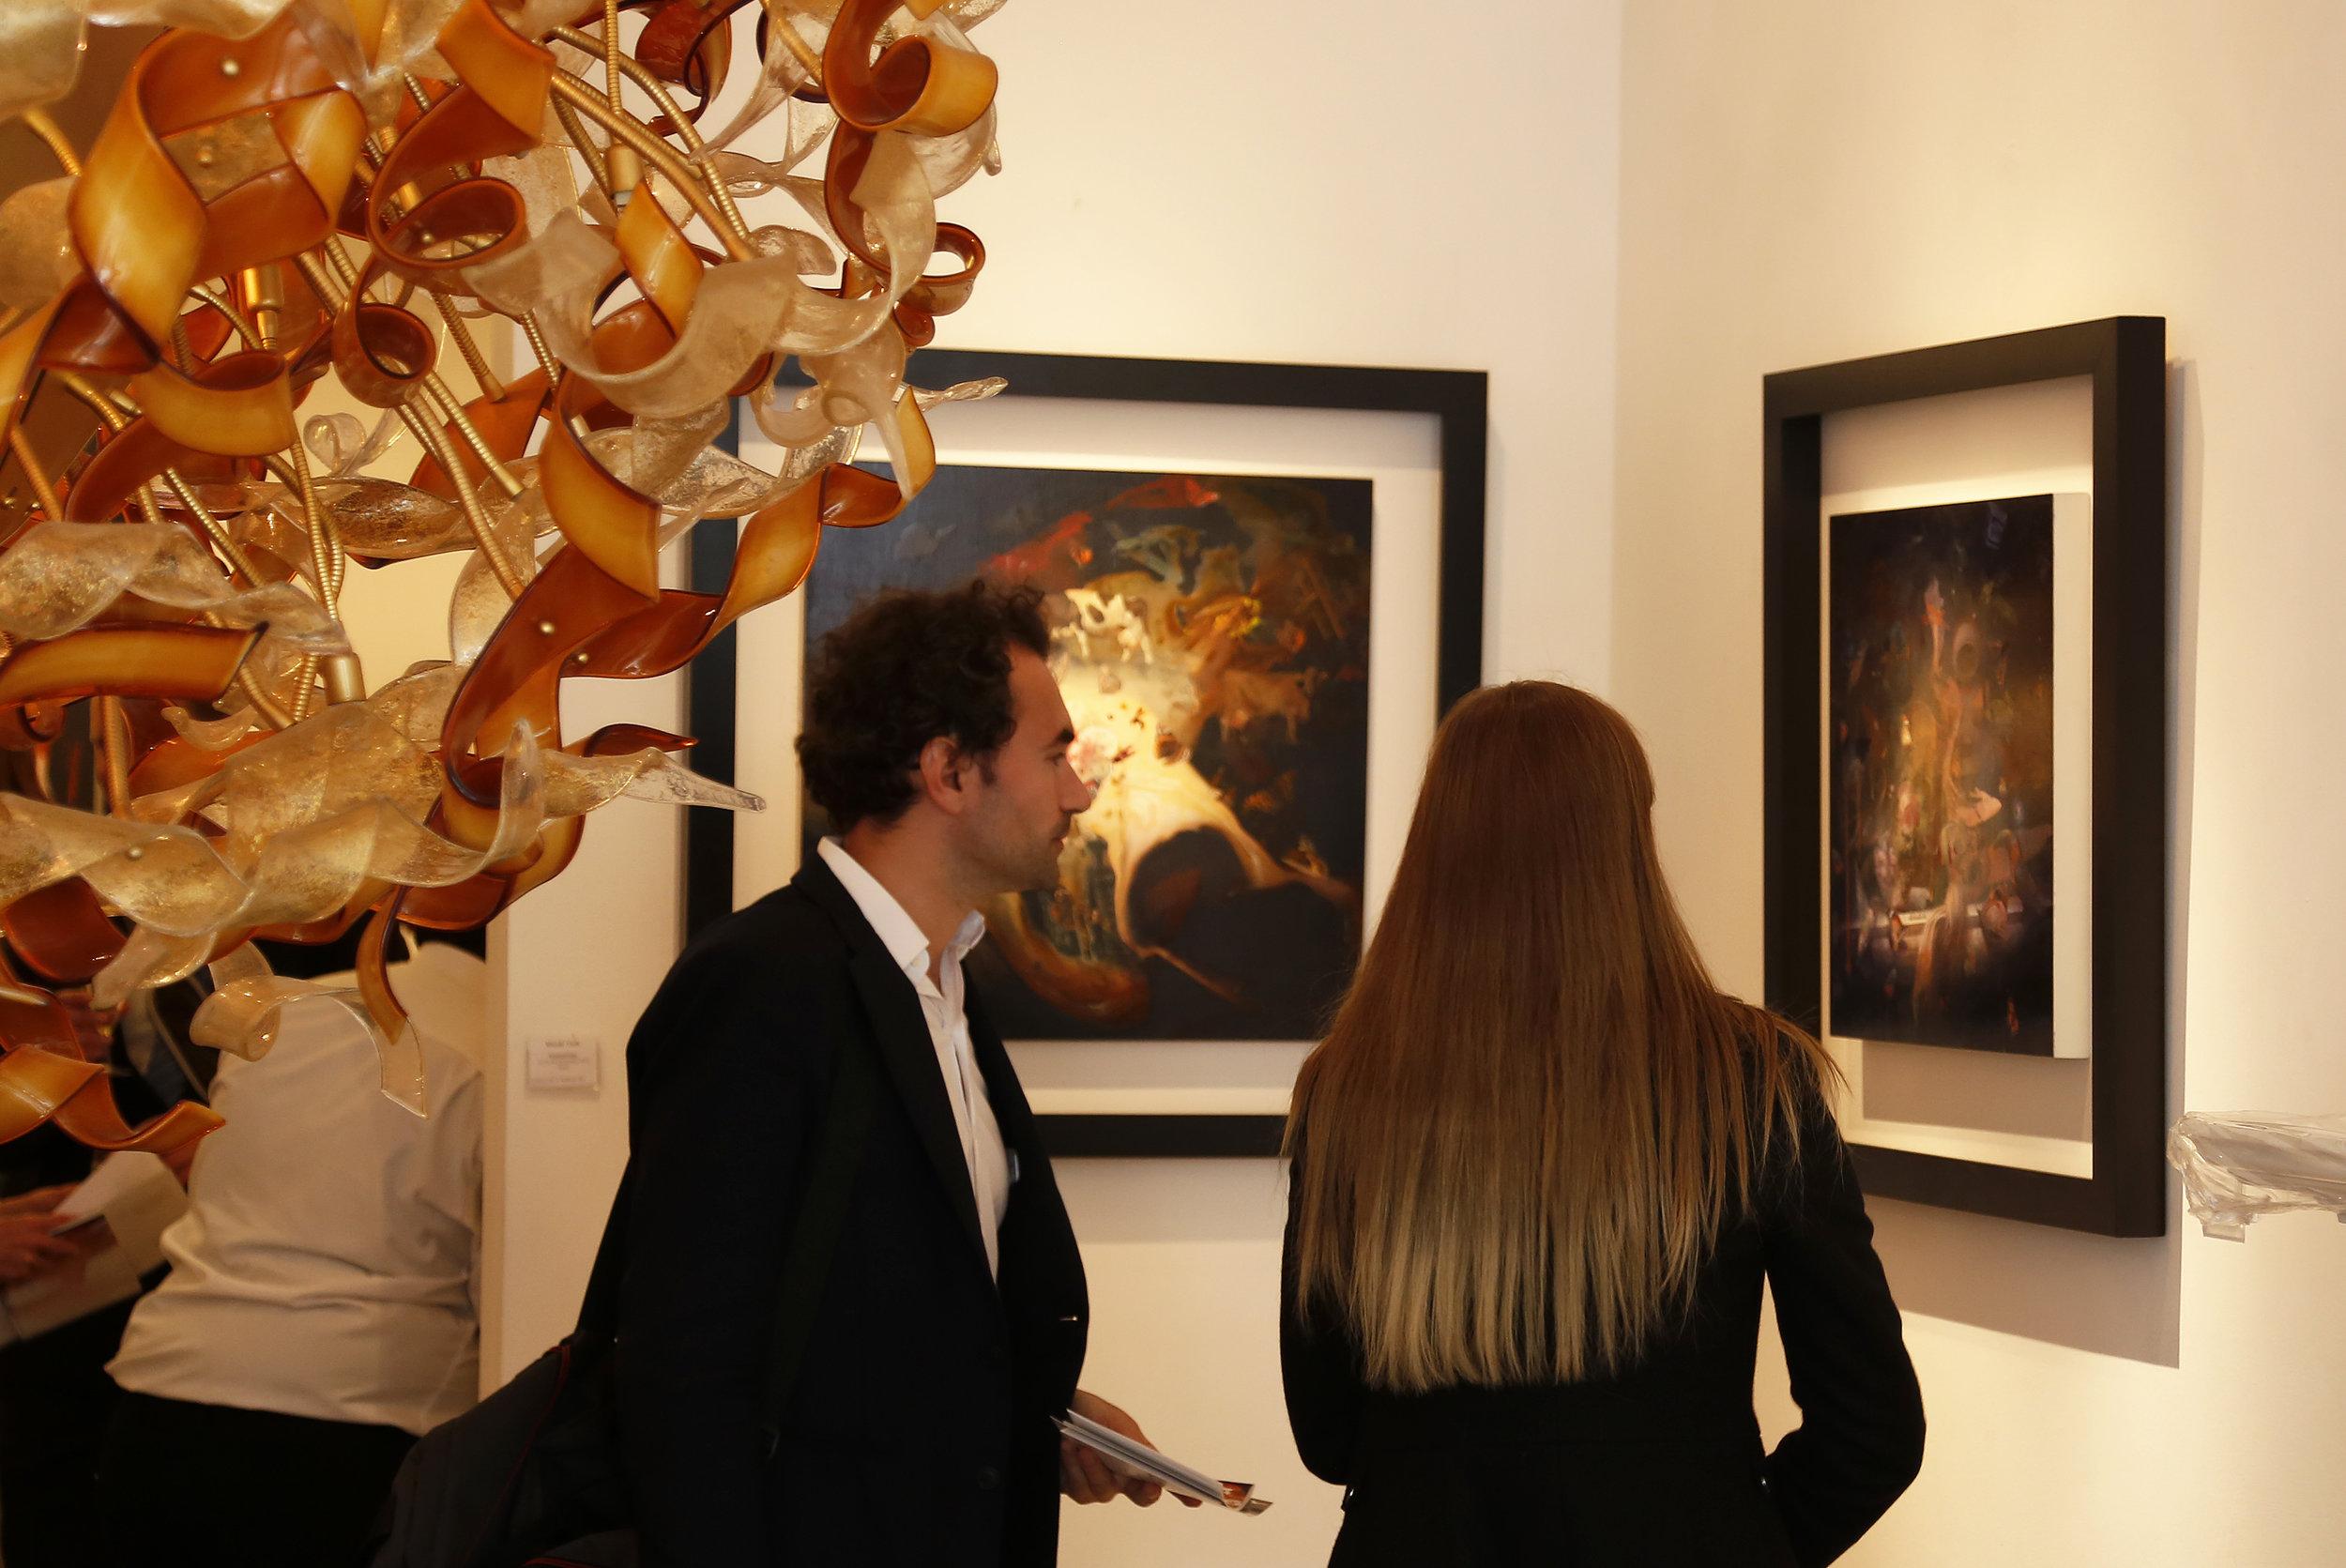 2-exhibition-photo-masaki-yada-ransom-art-gallery.jpg